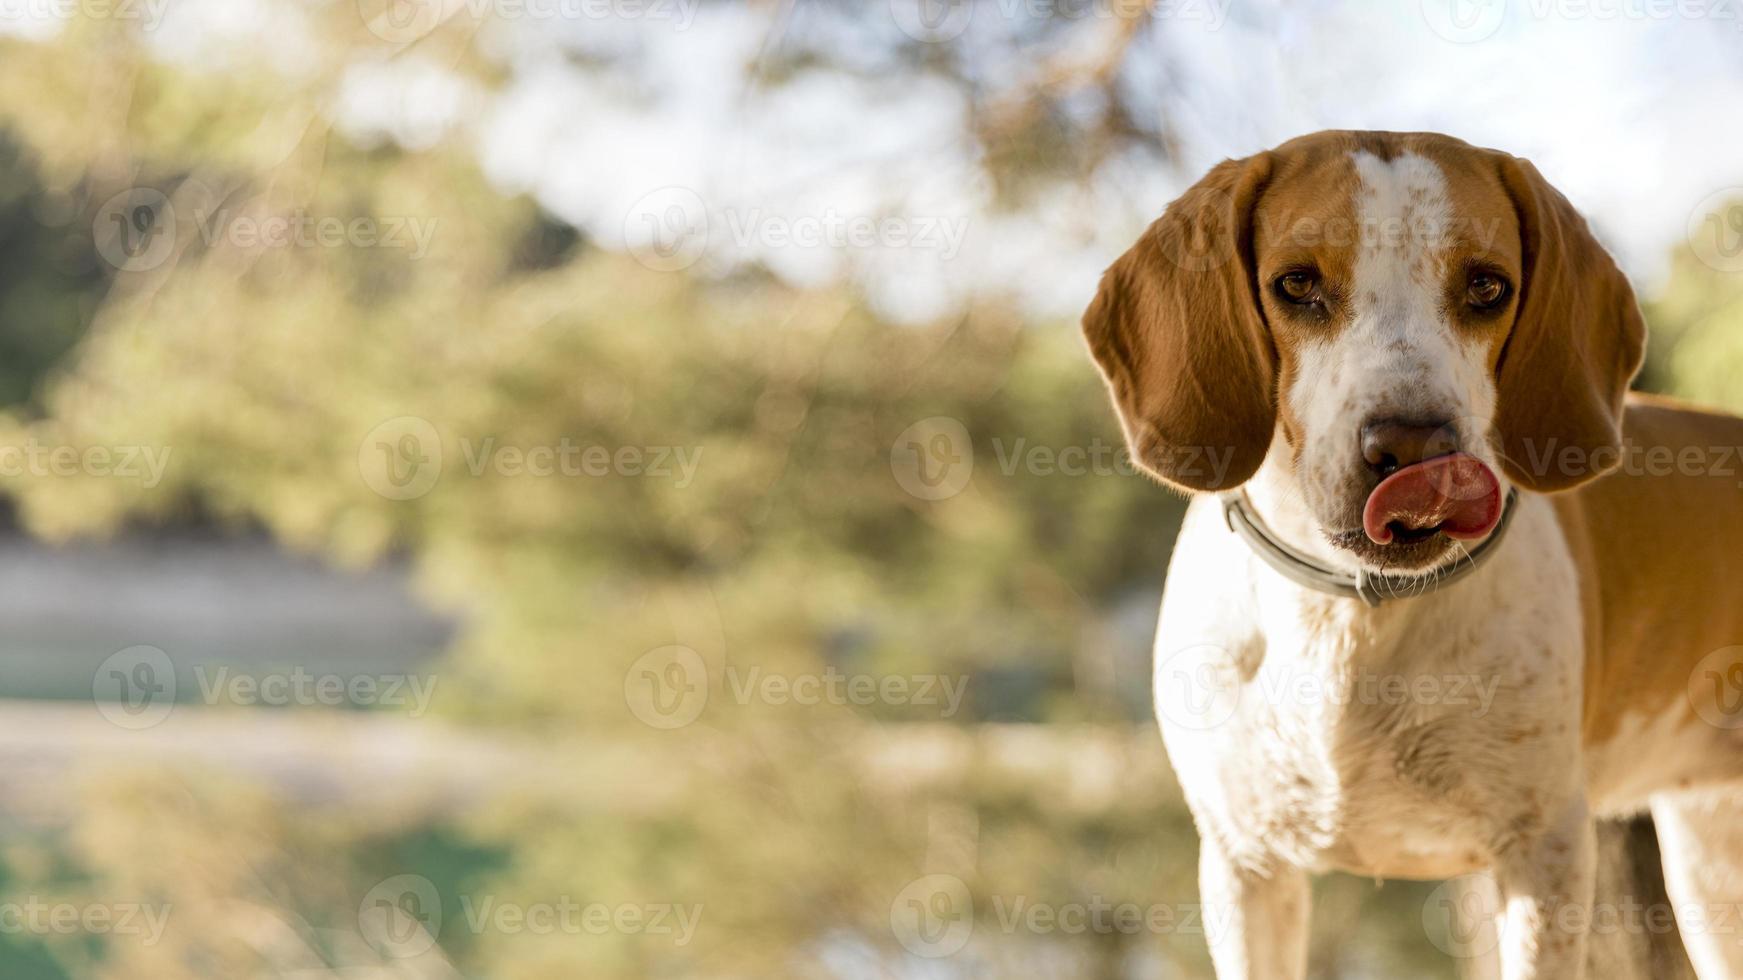 bom menino cachorro no fundo desfocado da natureza foto